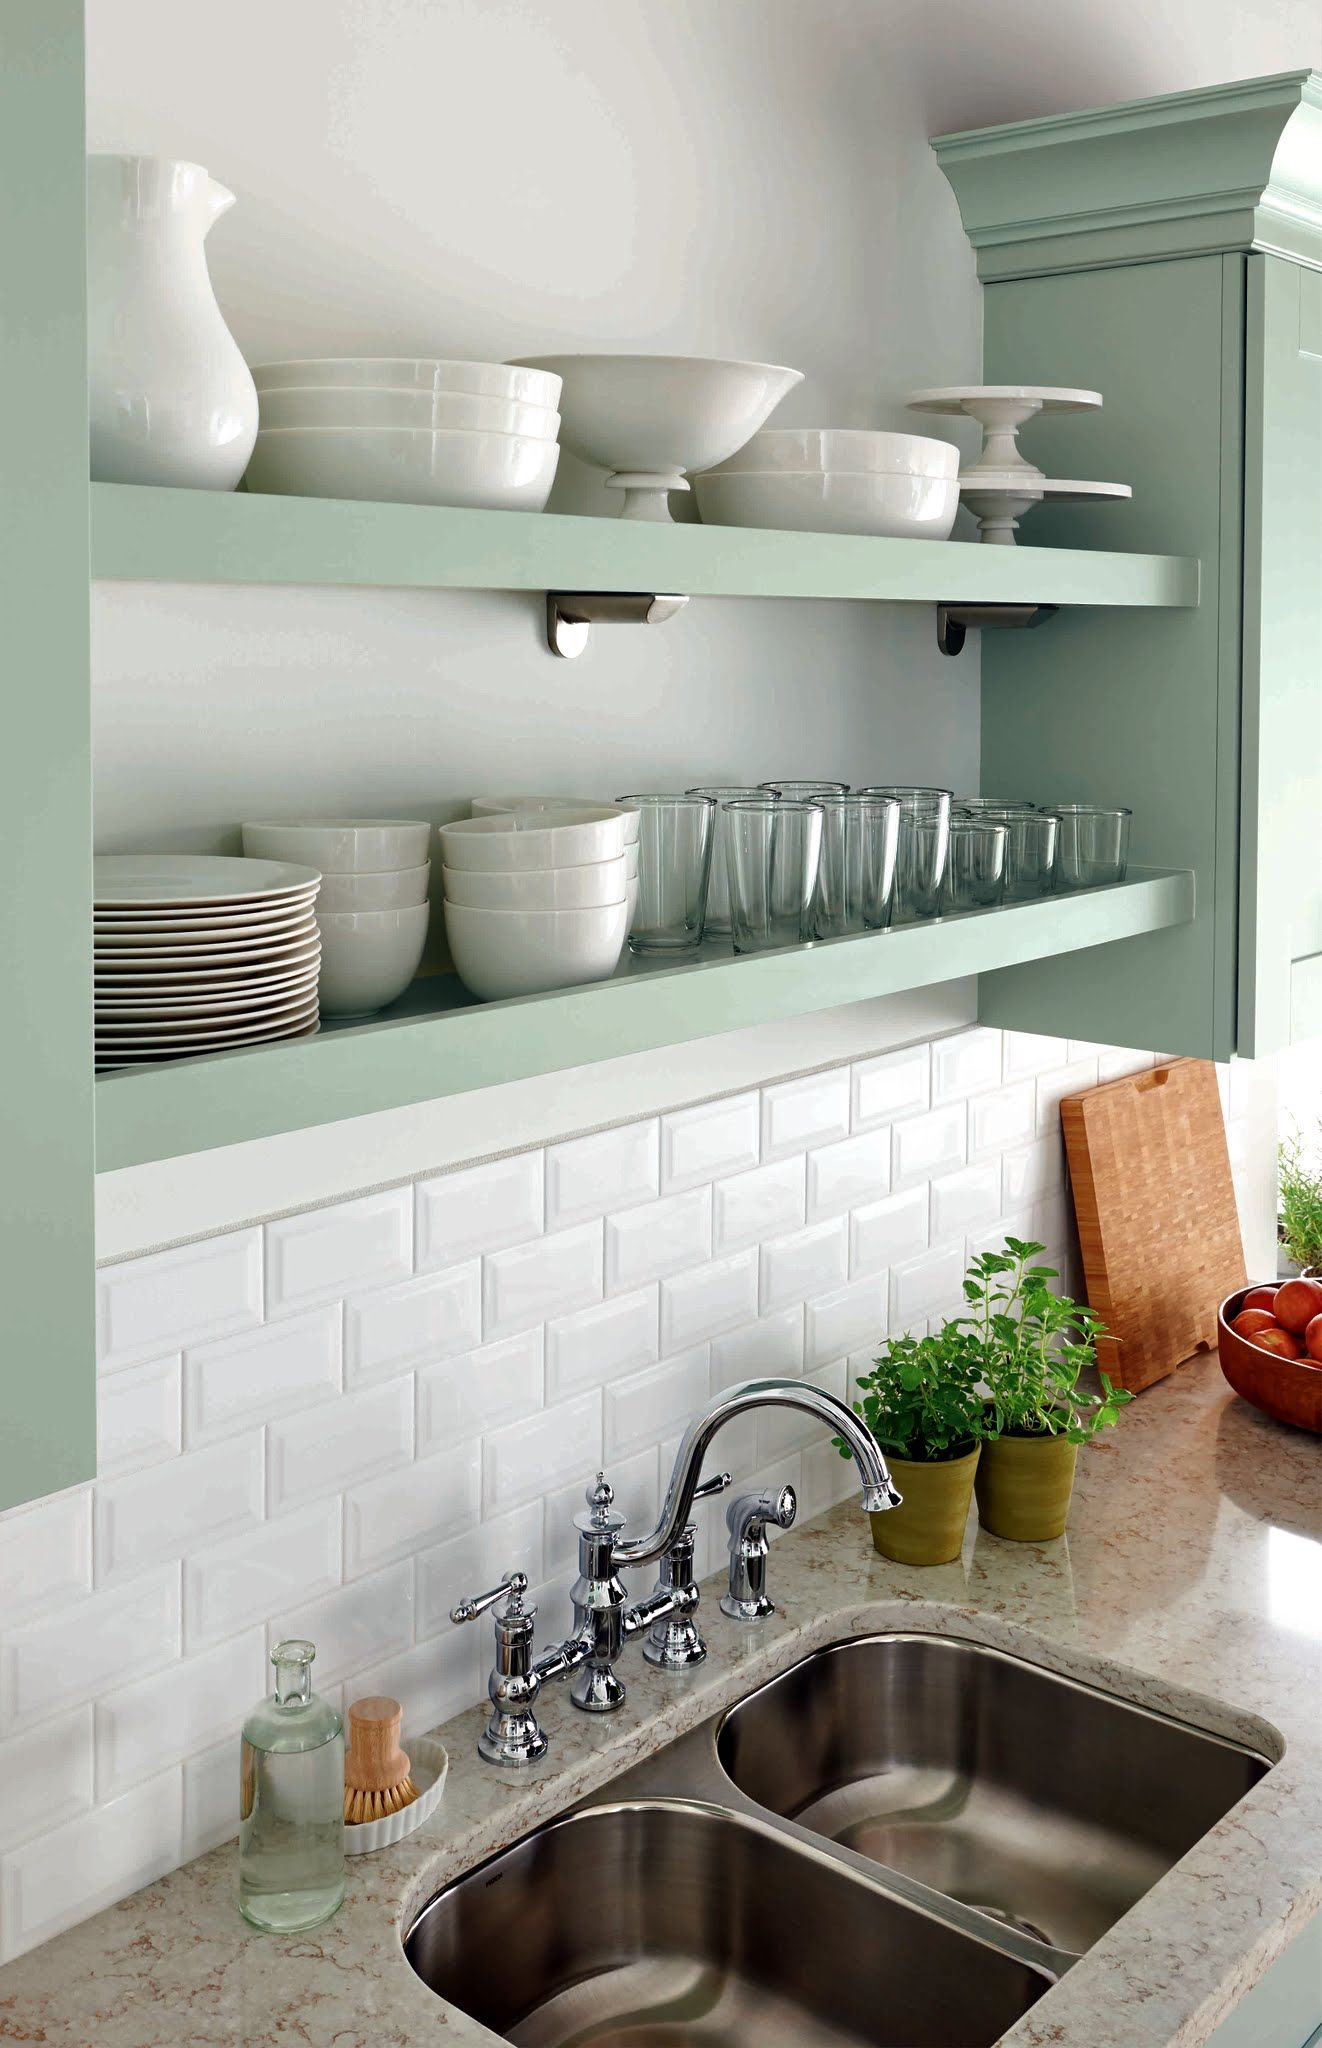 Kitchen Week At The Home Depot  The Martha Stewart Blog Prepossessing Design My Kitchen Home Depot Design Ideas